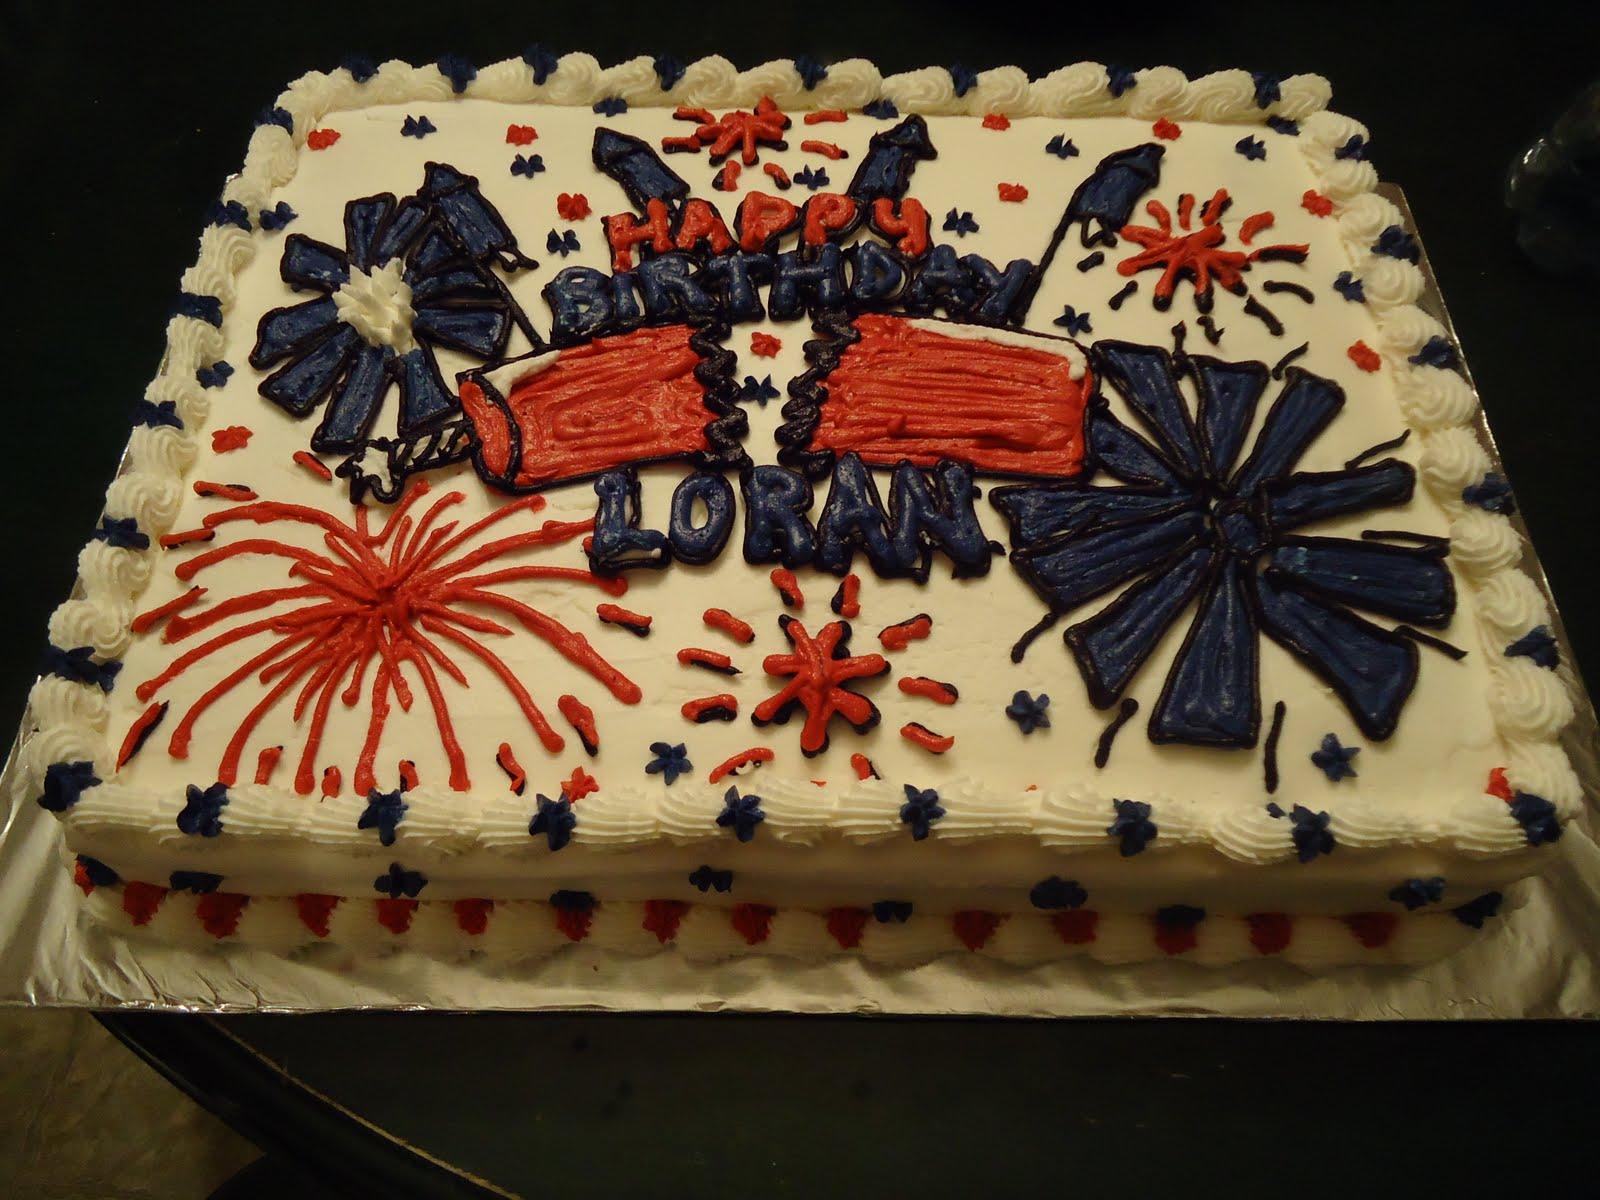 Cats Cake Creations Fireworks Birthday Cake